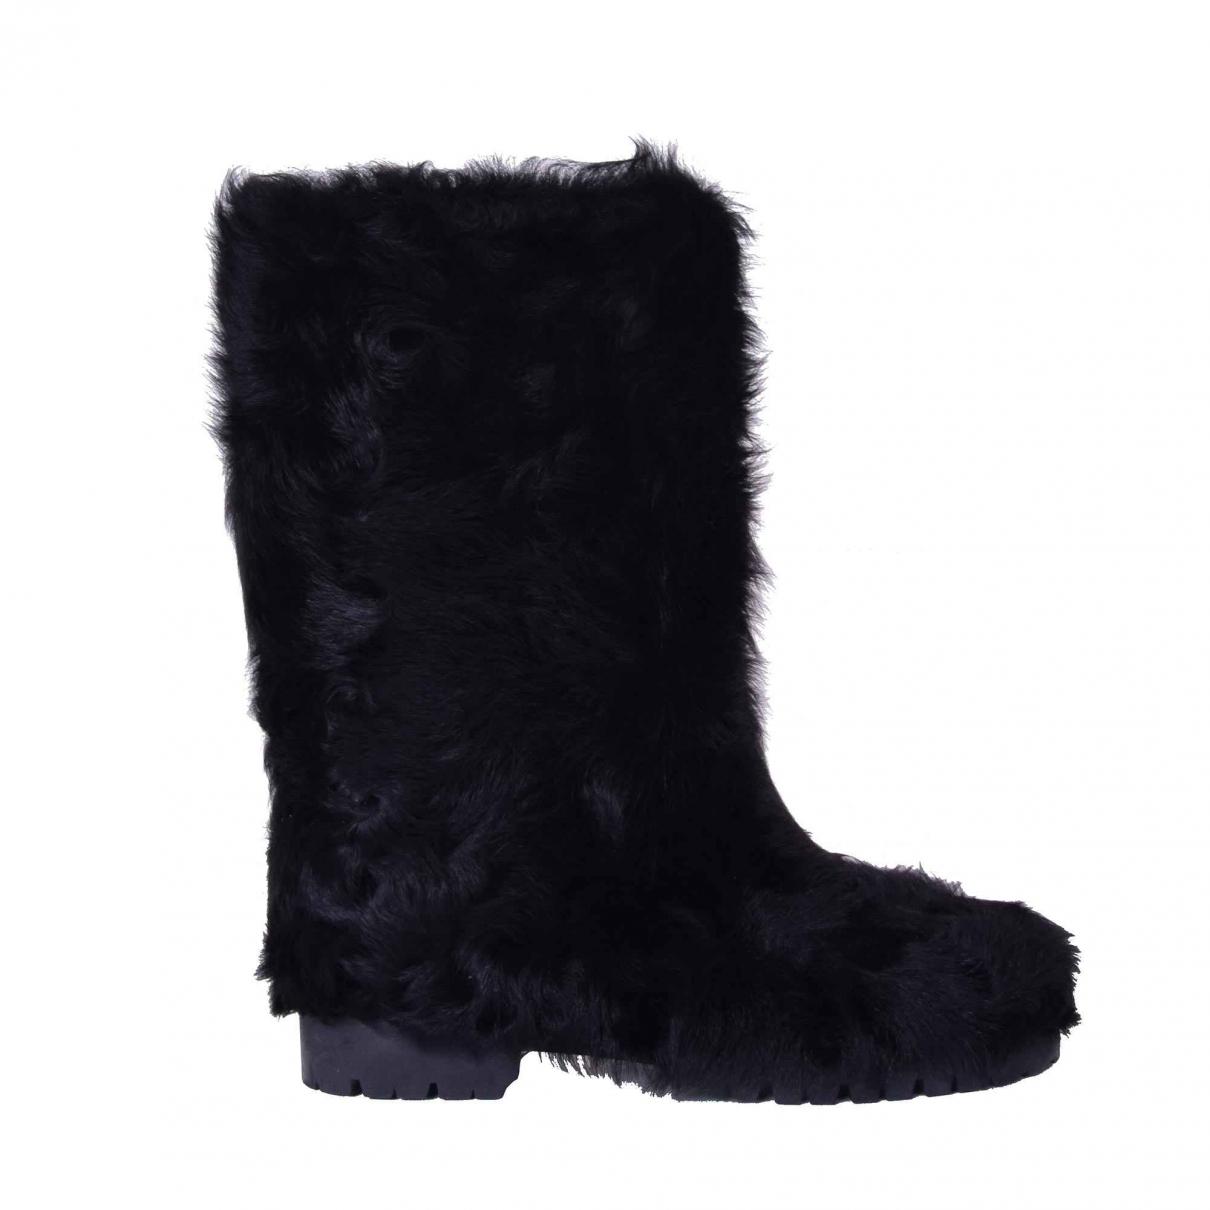 Dolce & Gabbana \N Black Fur Boots for Women 39 EU